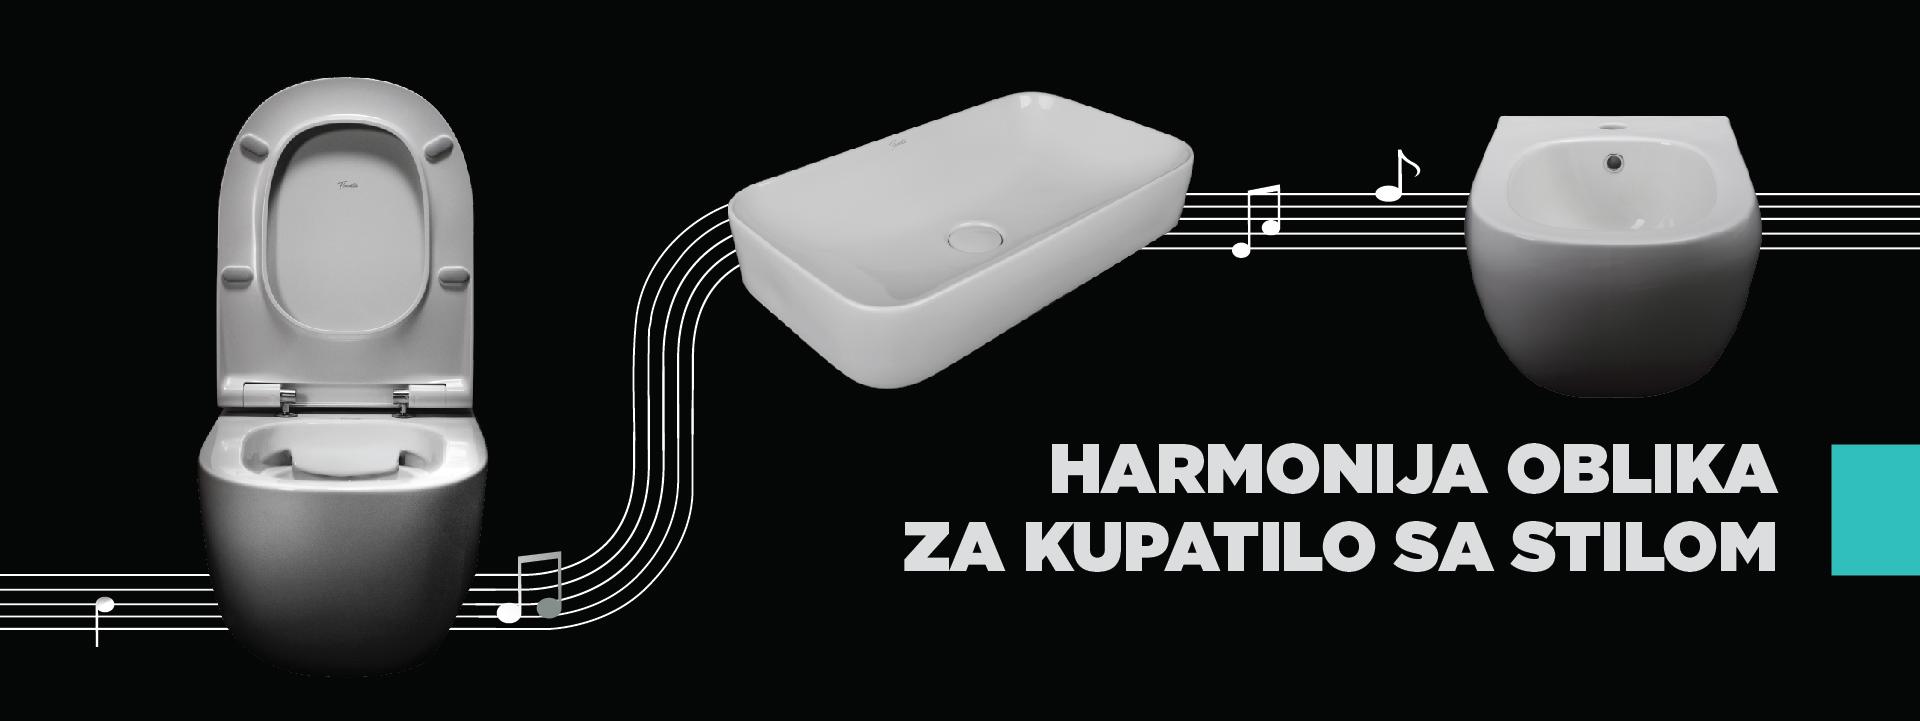 Harmonija oblika 2